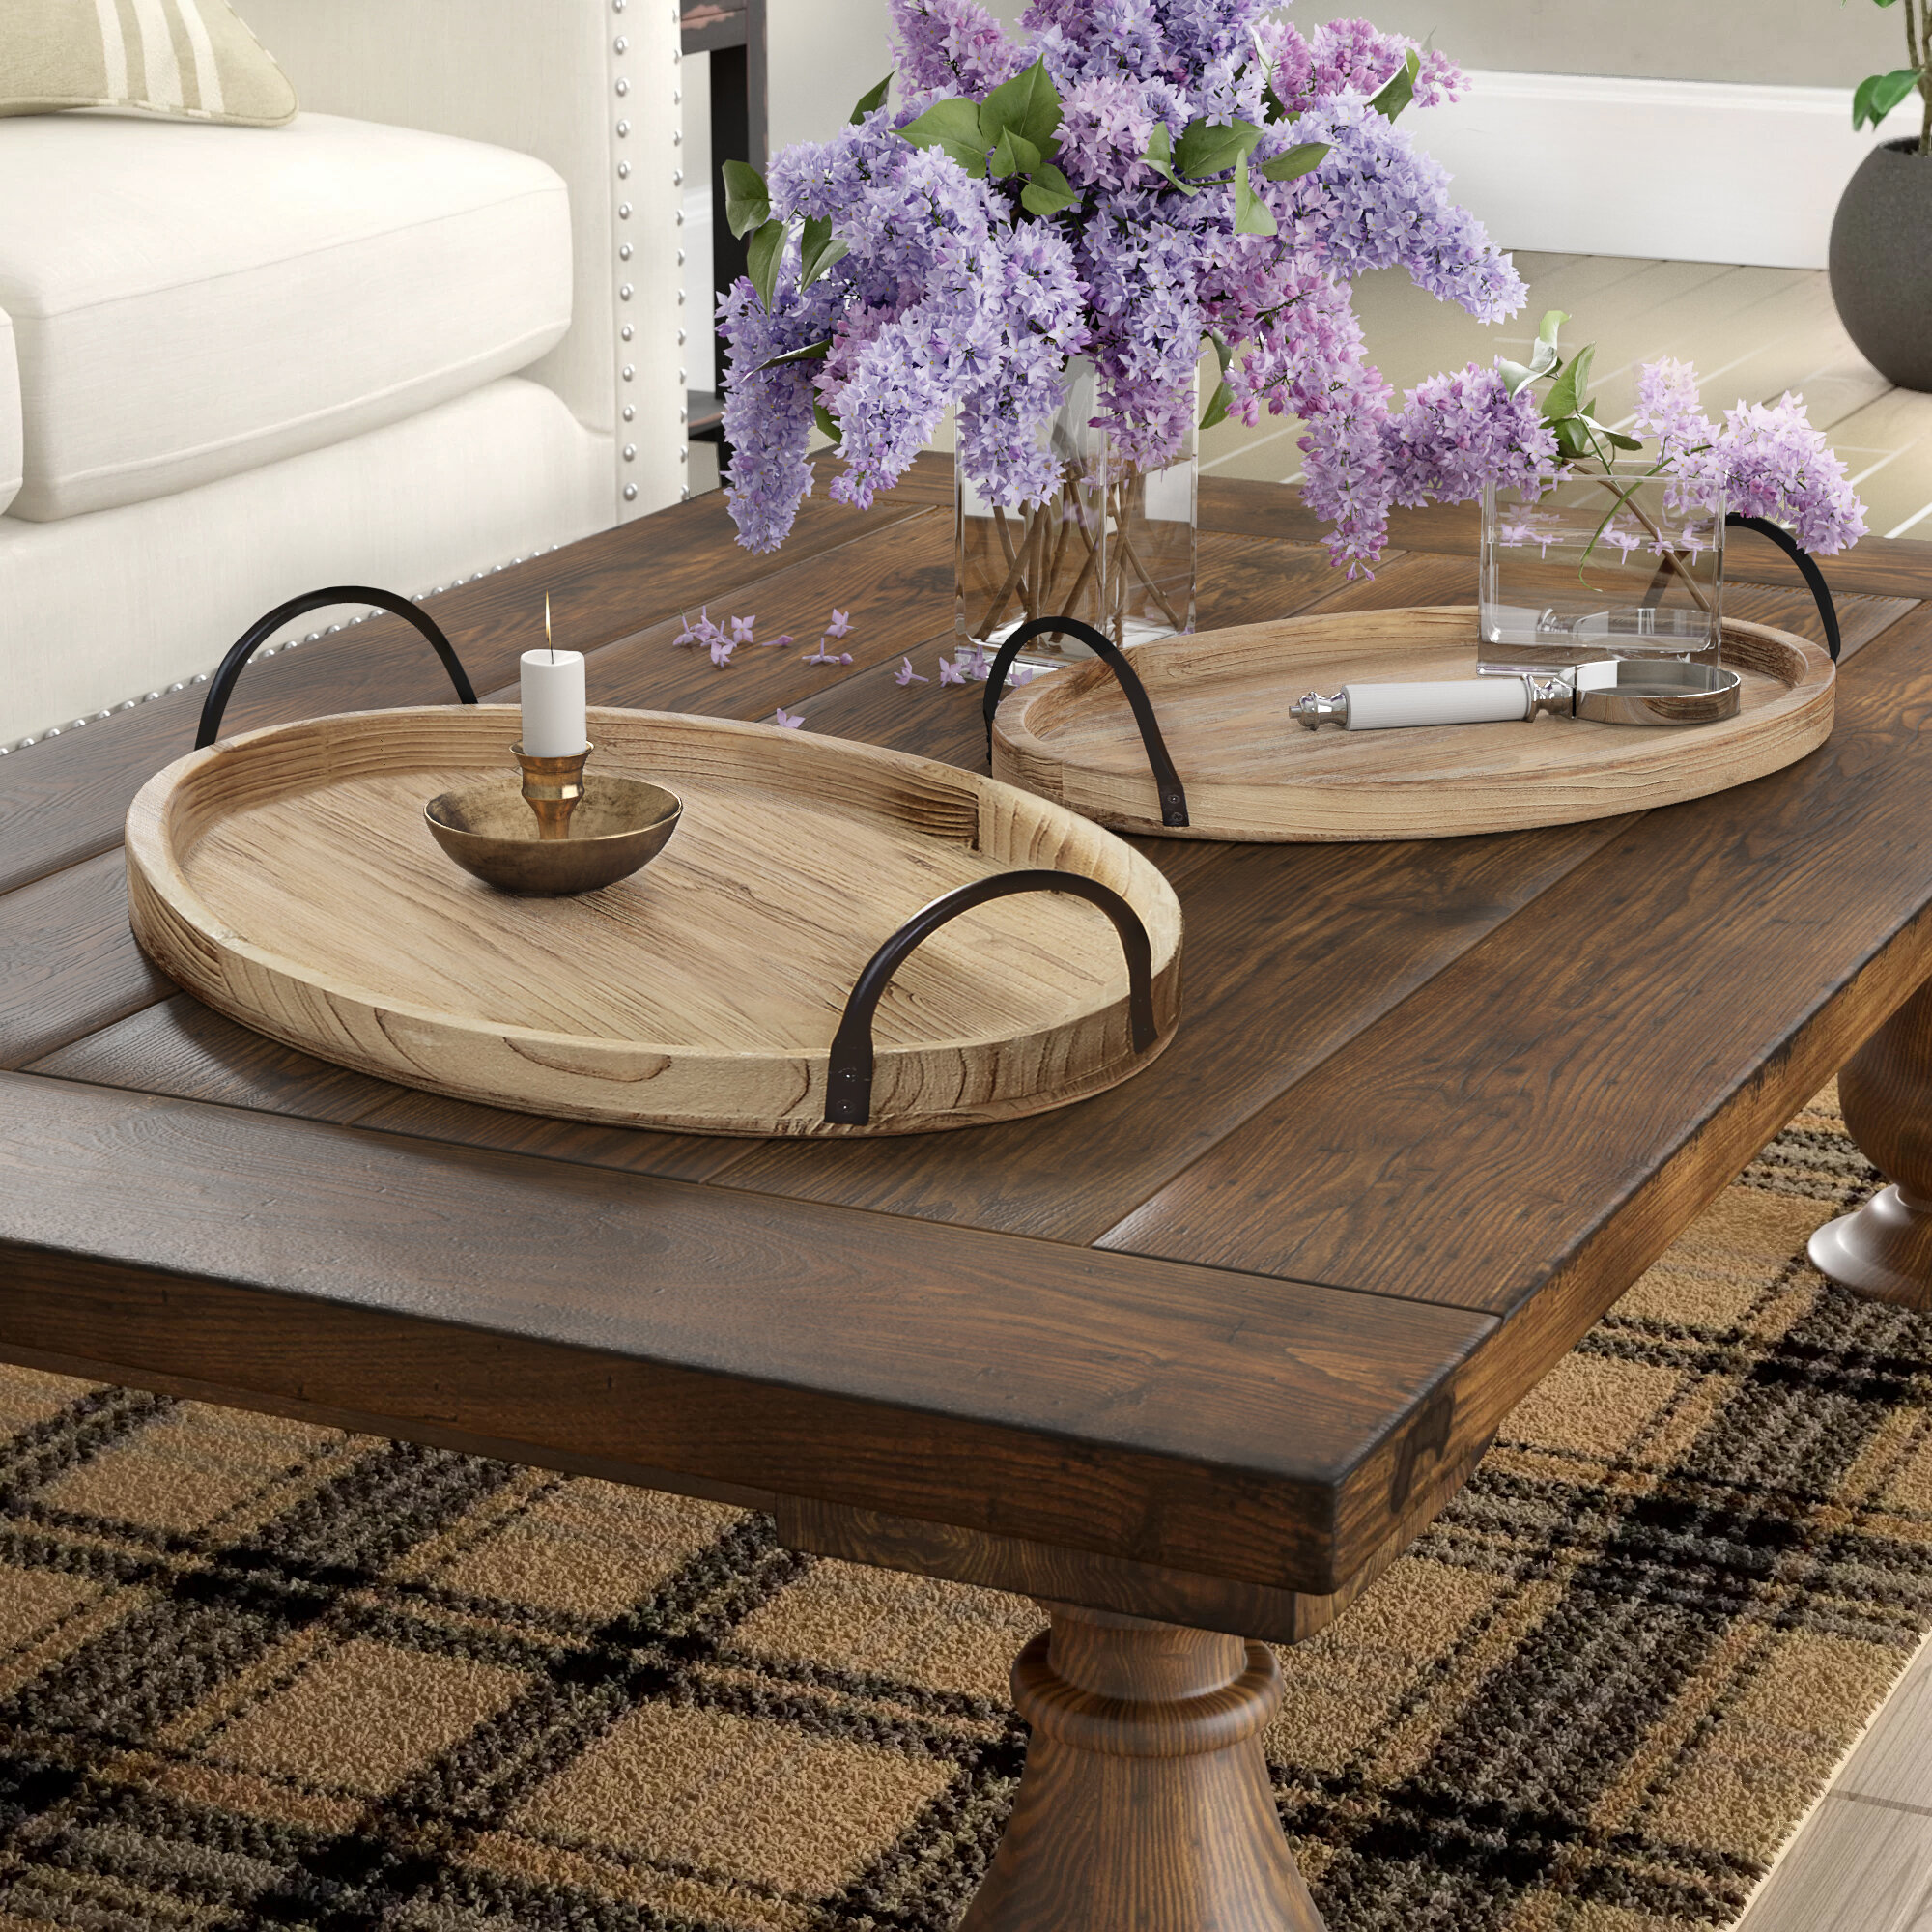 Gracie Oaks Paull 2 Piece Coffee Table Tray Set Reviews Wayfair